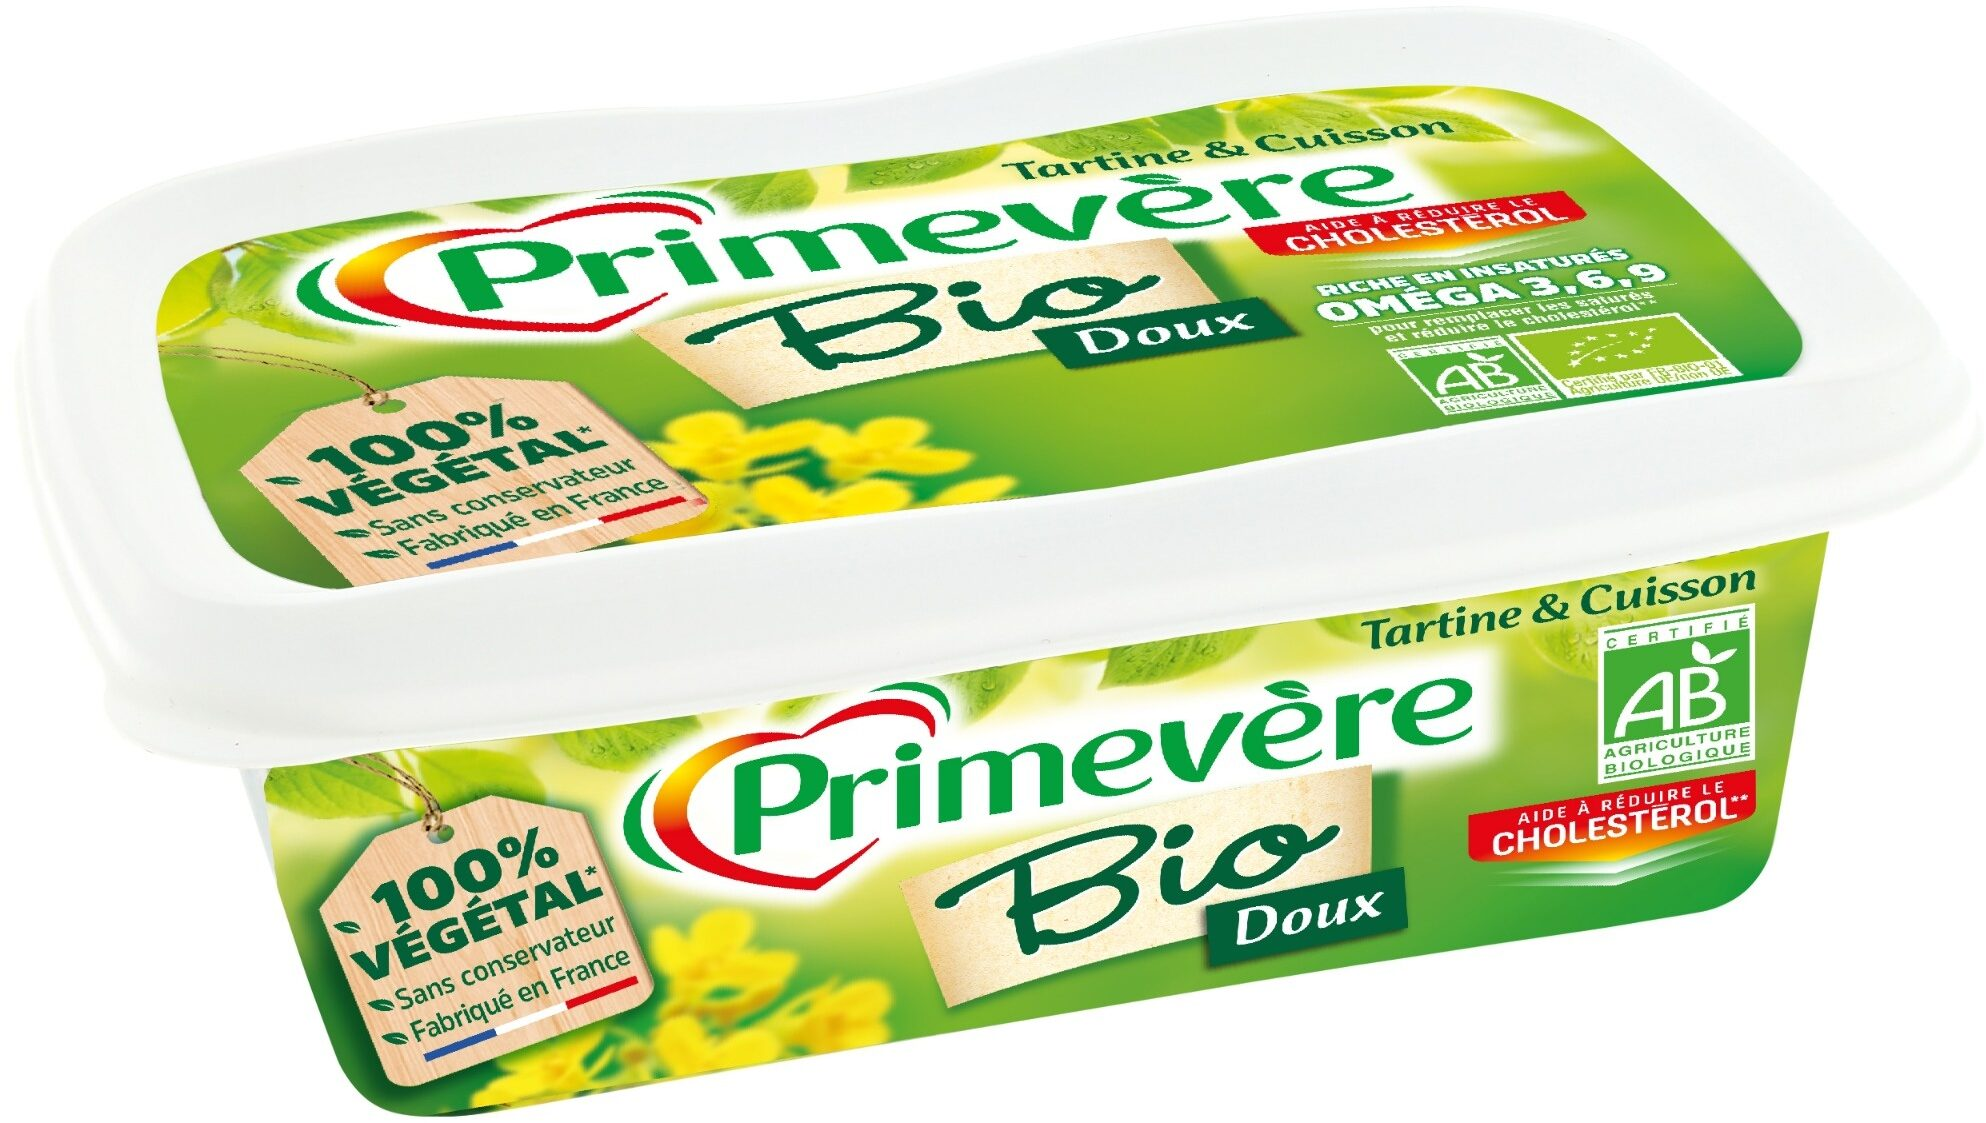 Primevère Bio Tartine & Cuisson - Produit - fr